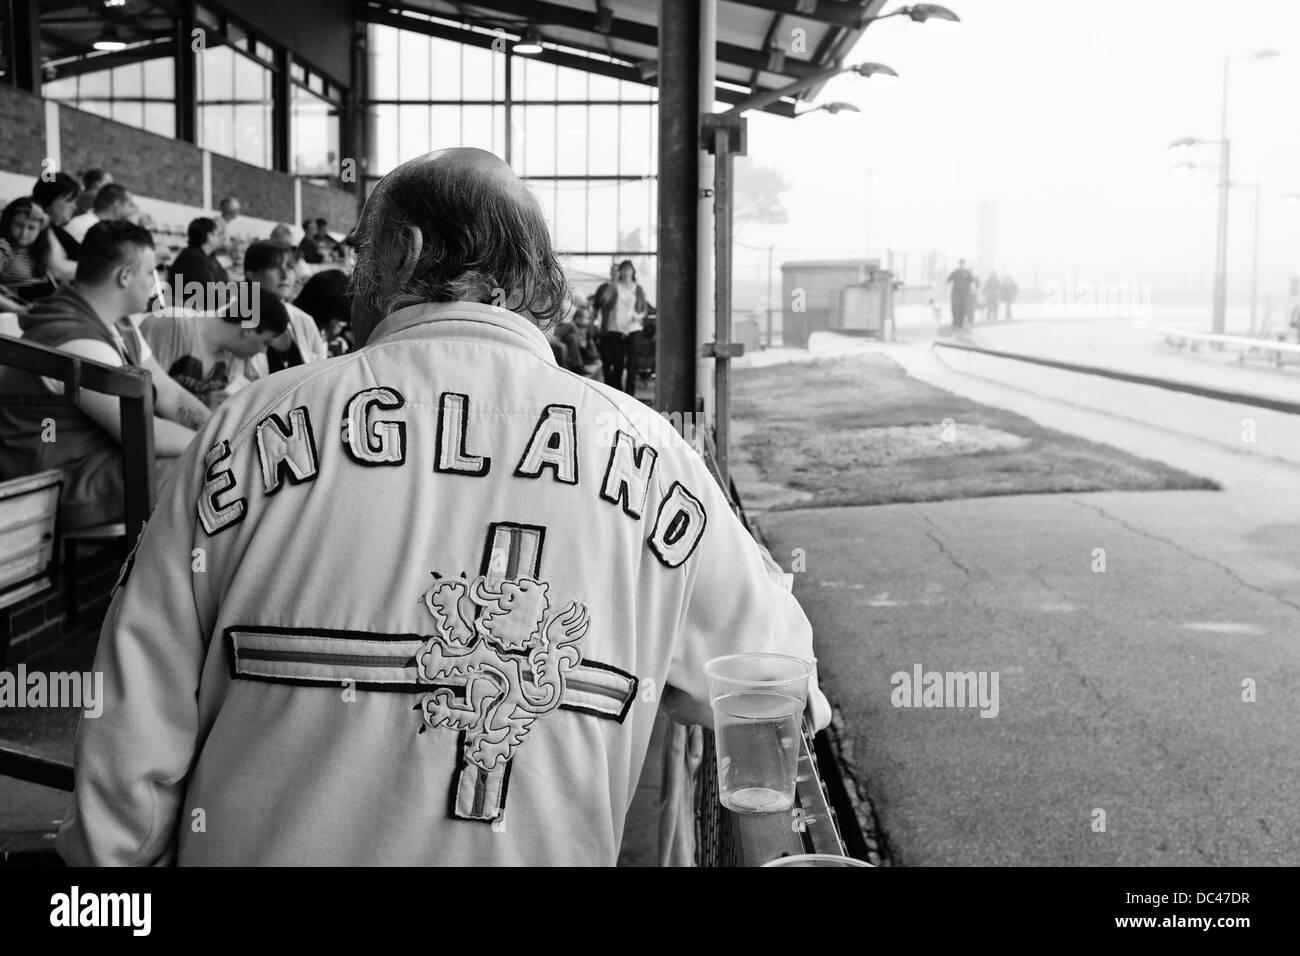 Spectator wearing England Jacket drinking and watching greyhound race - Stock Image